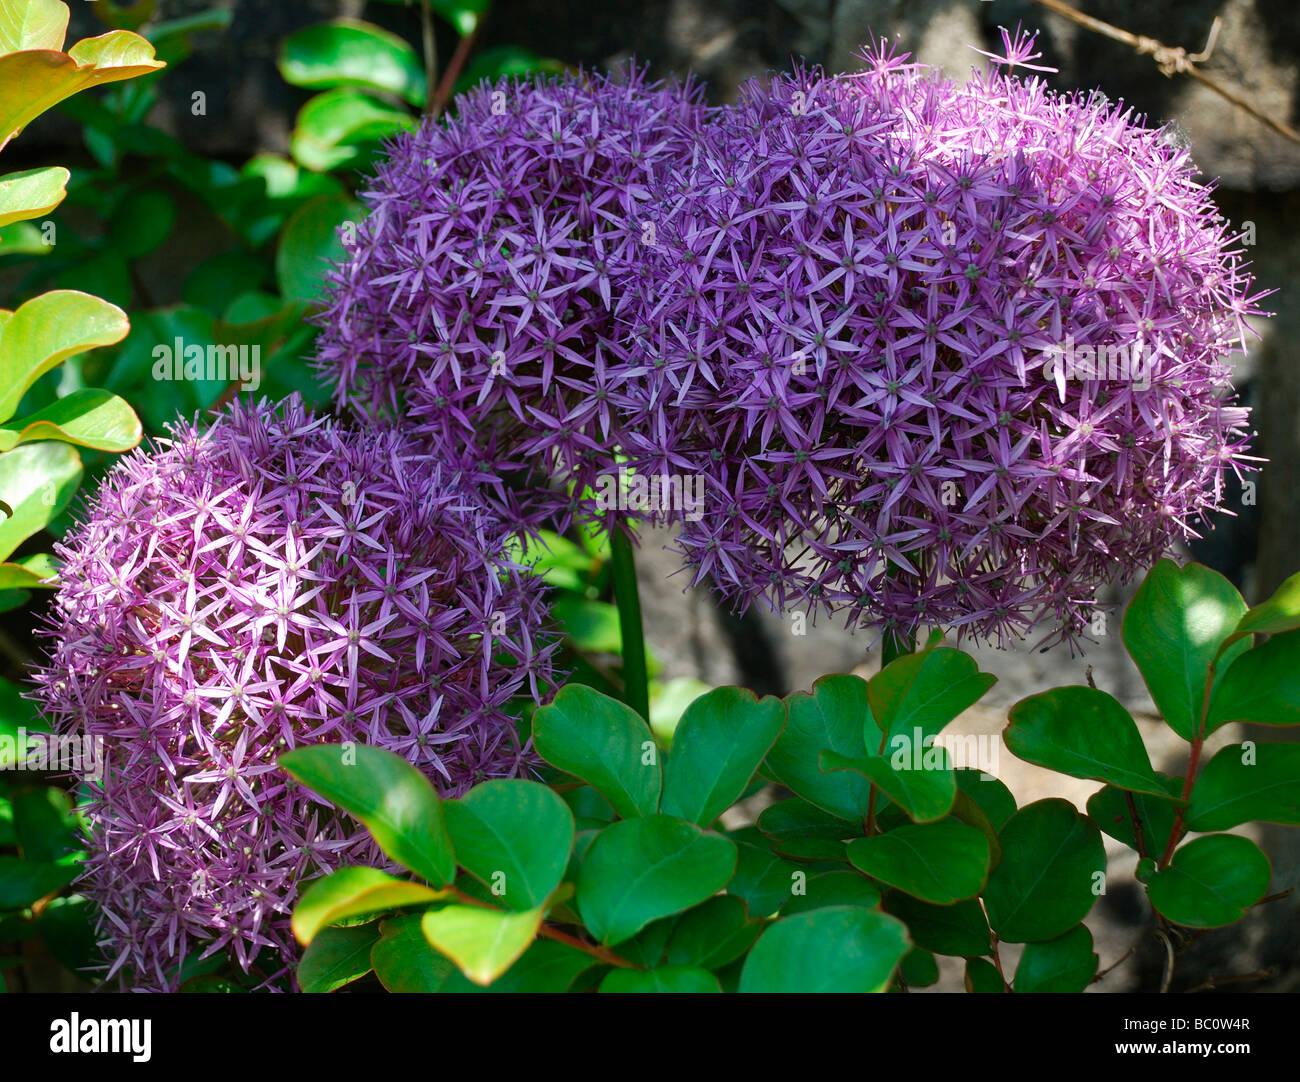 liliaceae allium globemaster large purple flowers flower head, Beautiful flower